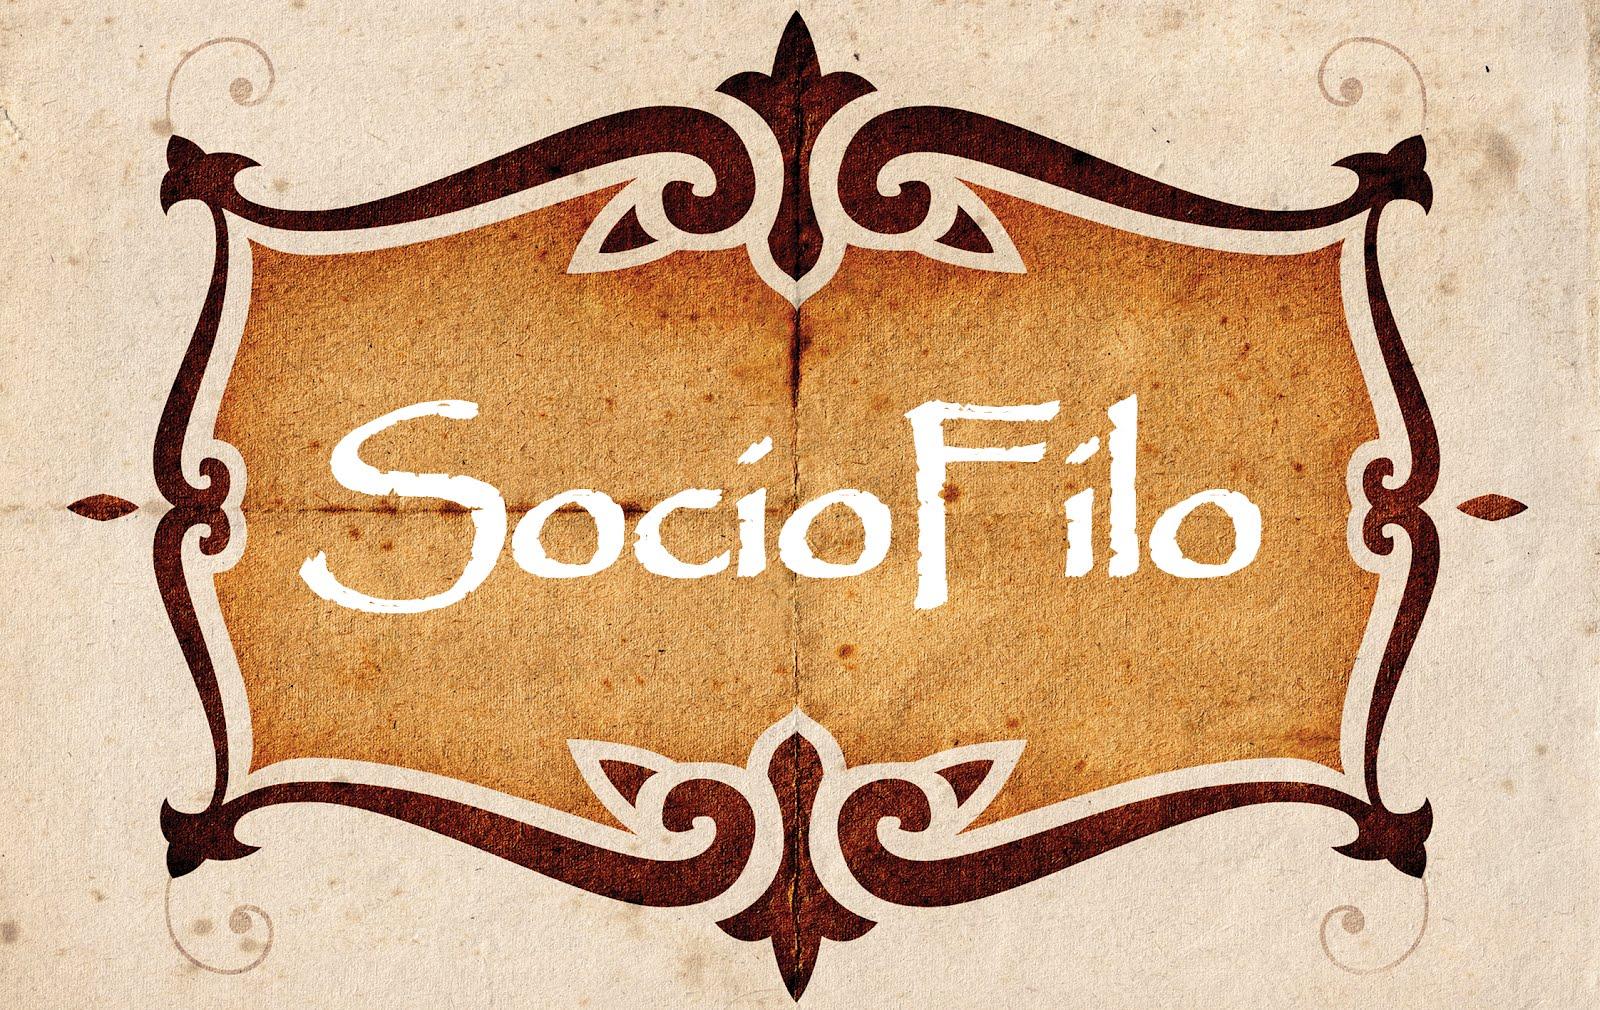 SocioFilo